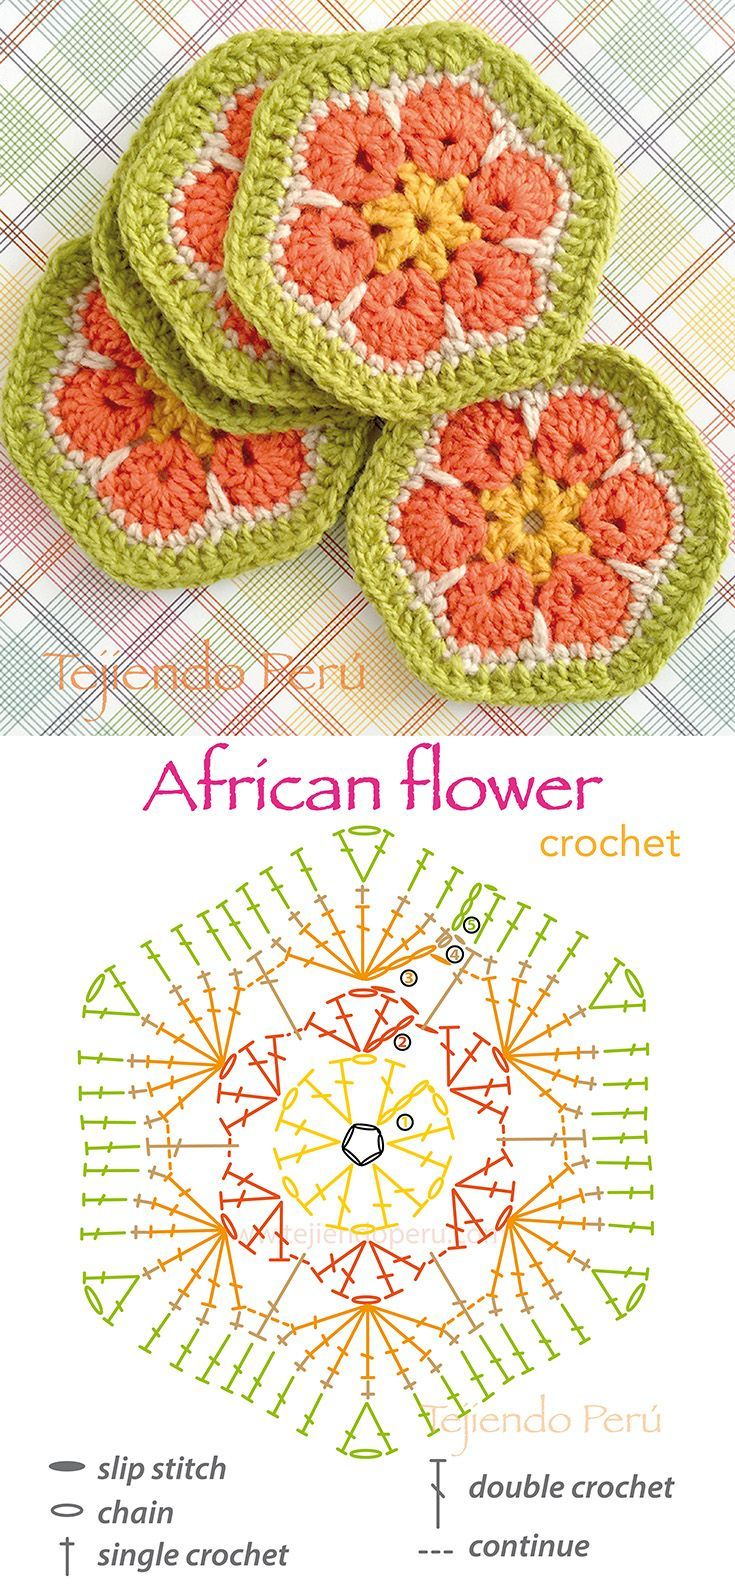 Crochet african flower pattern (chart or diagram)!: | Ganchillo ...